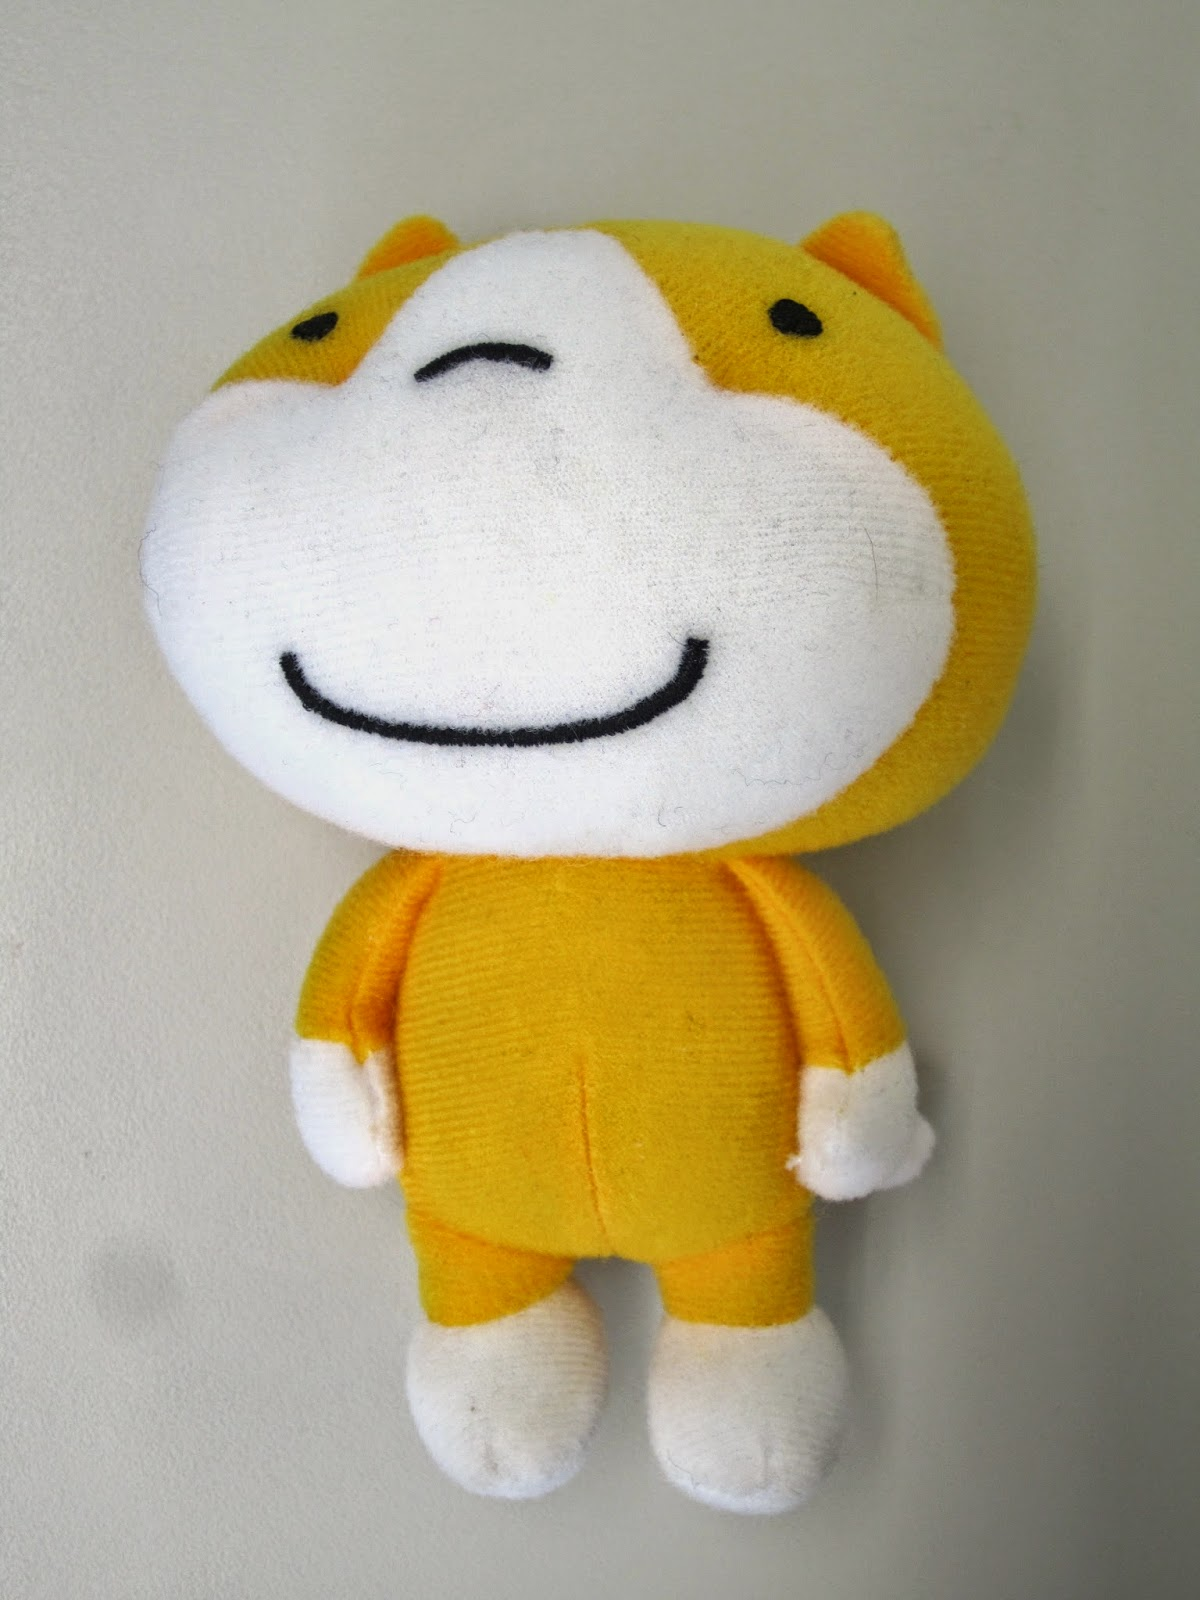 Towada Families Ninnin Garlic Cat Mascot Character